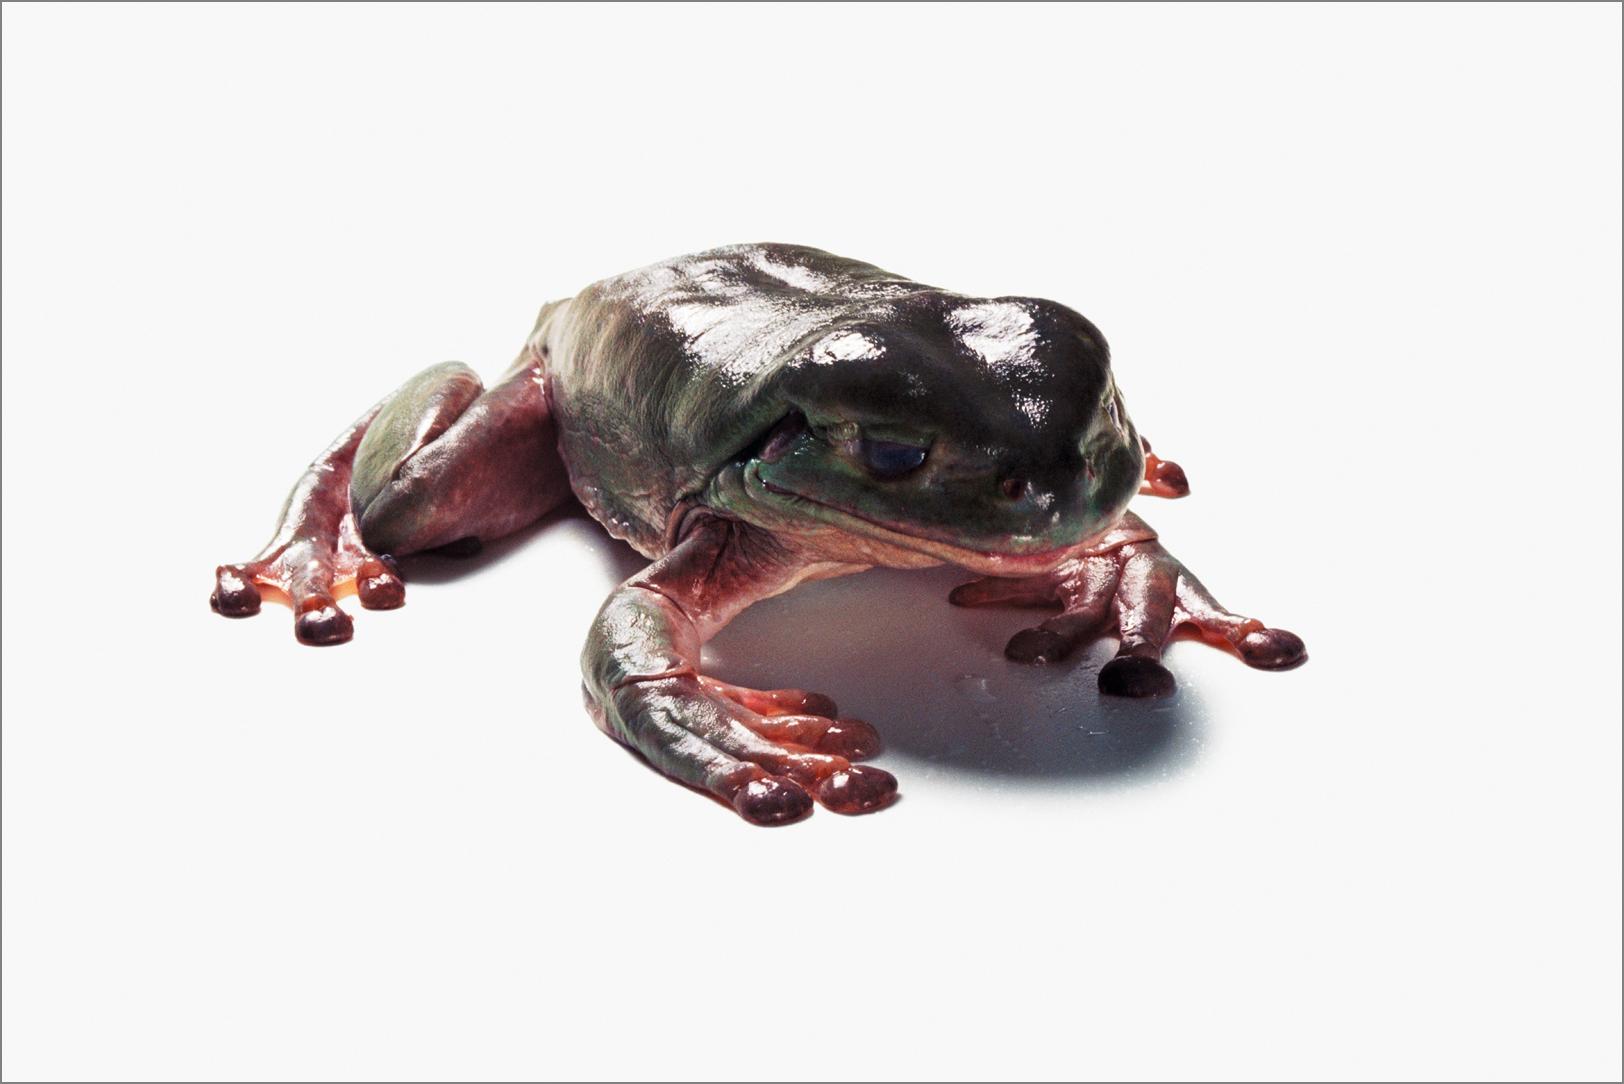 fc_frog8_4g.jpg